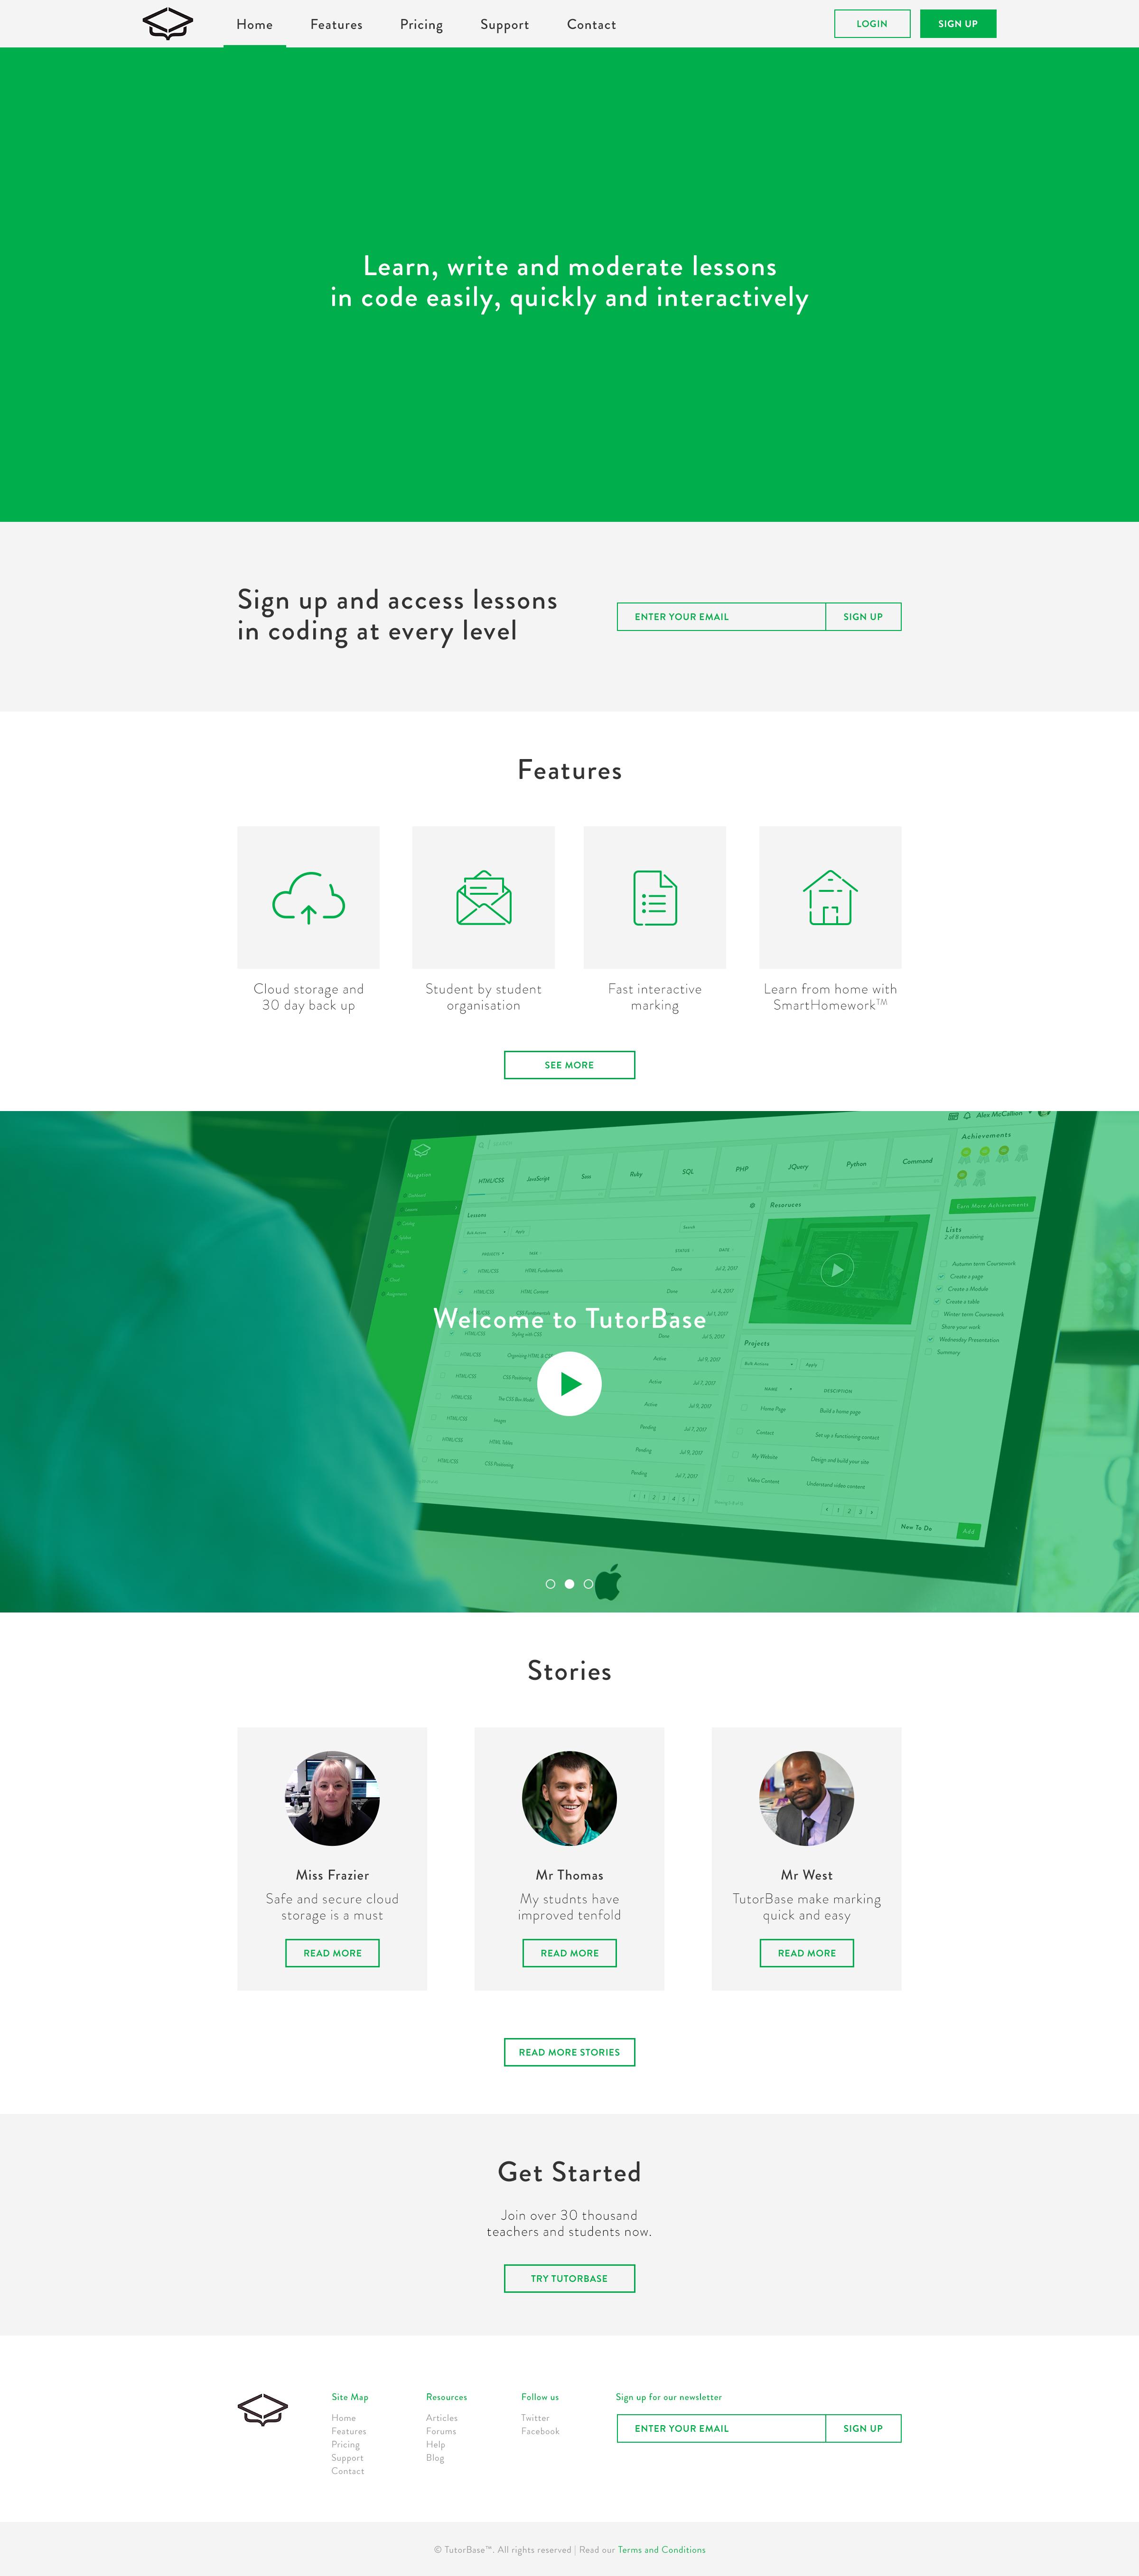 tutorbase_site